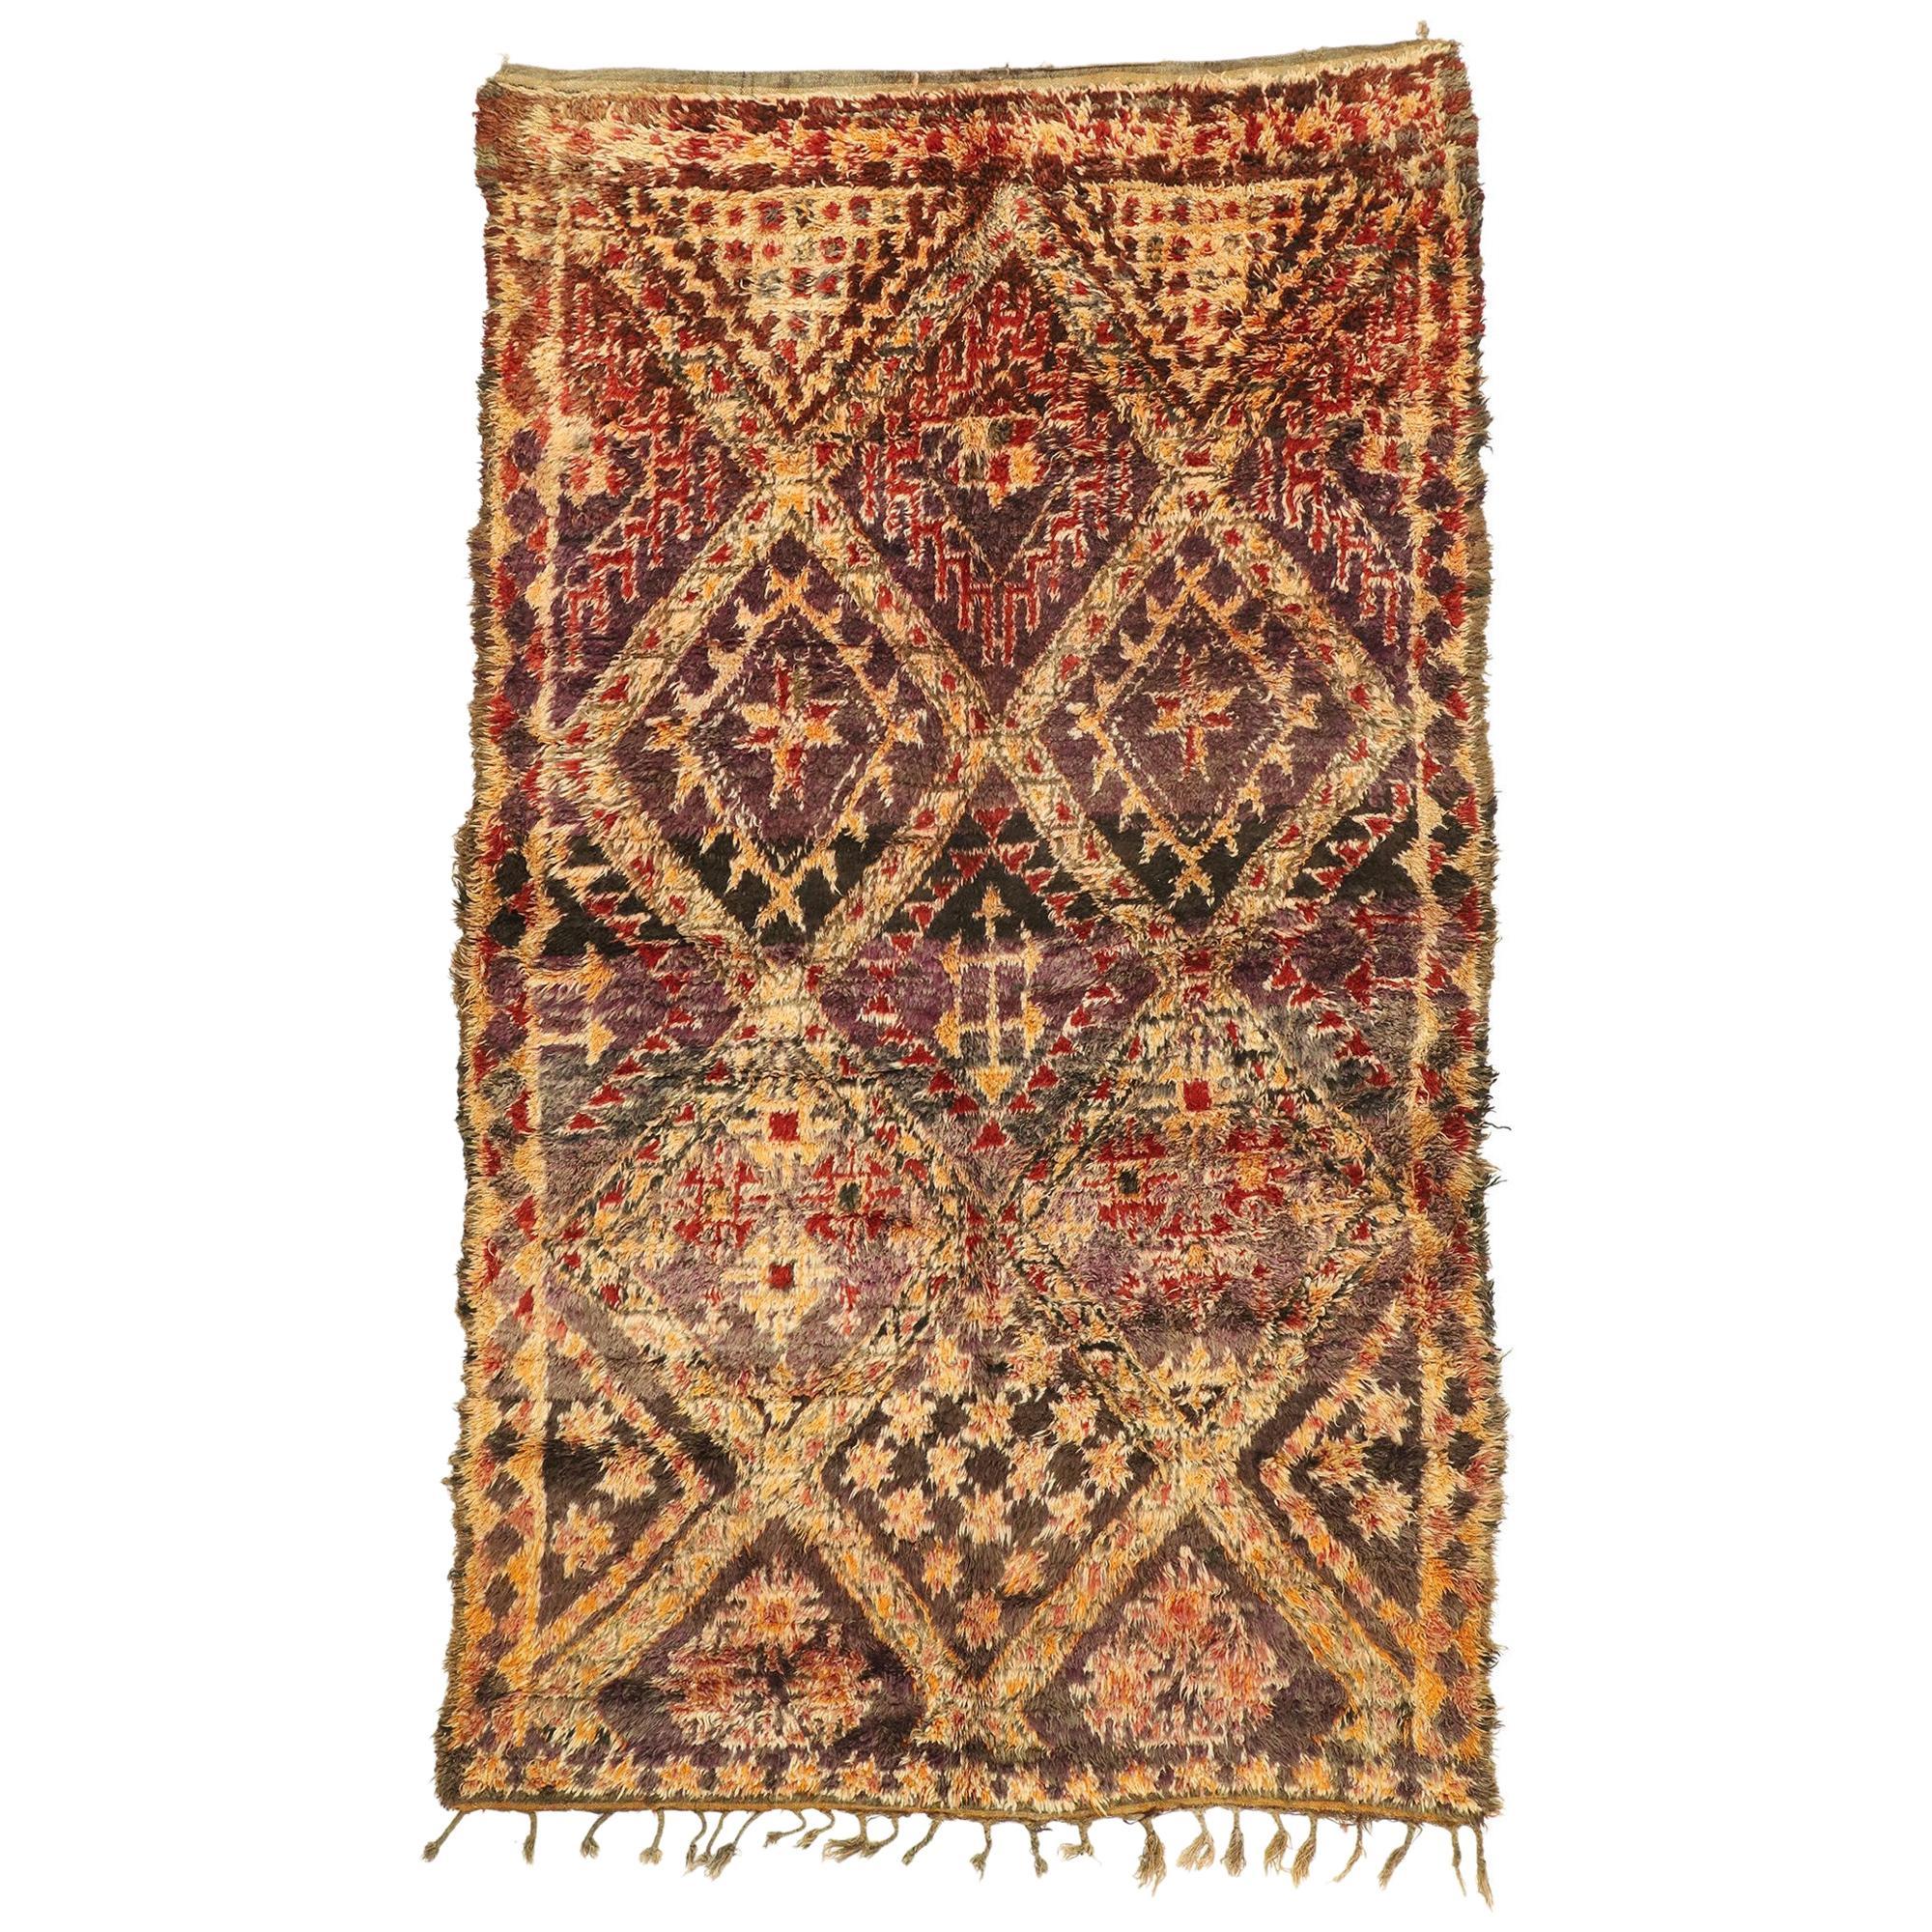 Vintage Berber Moroccan Rug, Brown Zayane Carpet with Mid-Century Modern Style